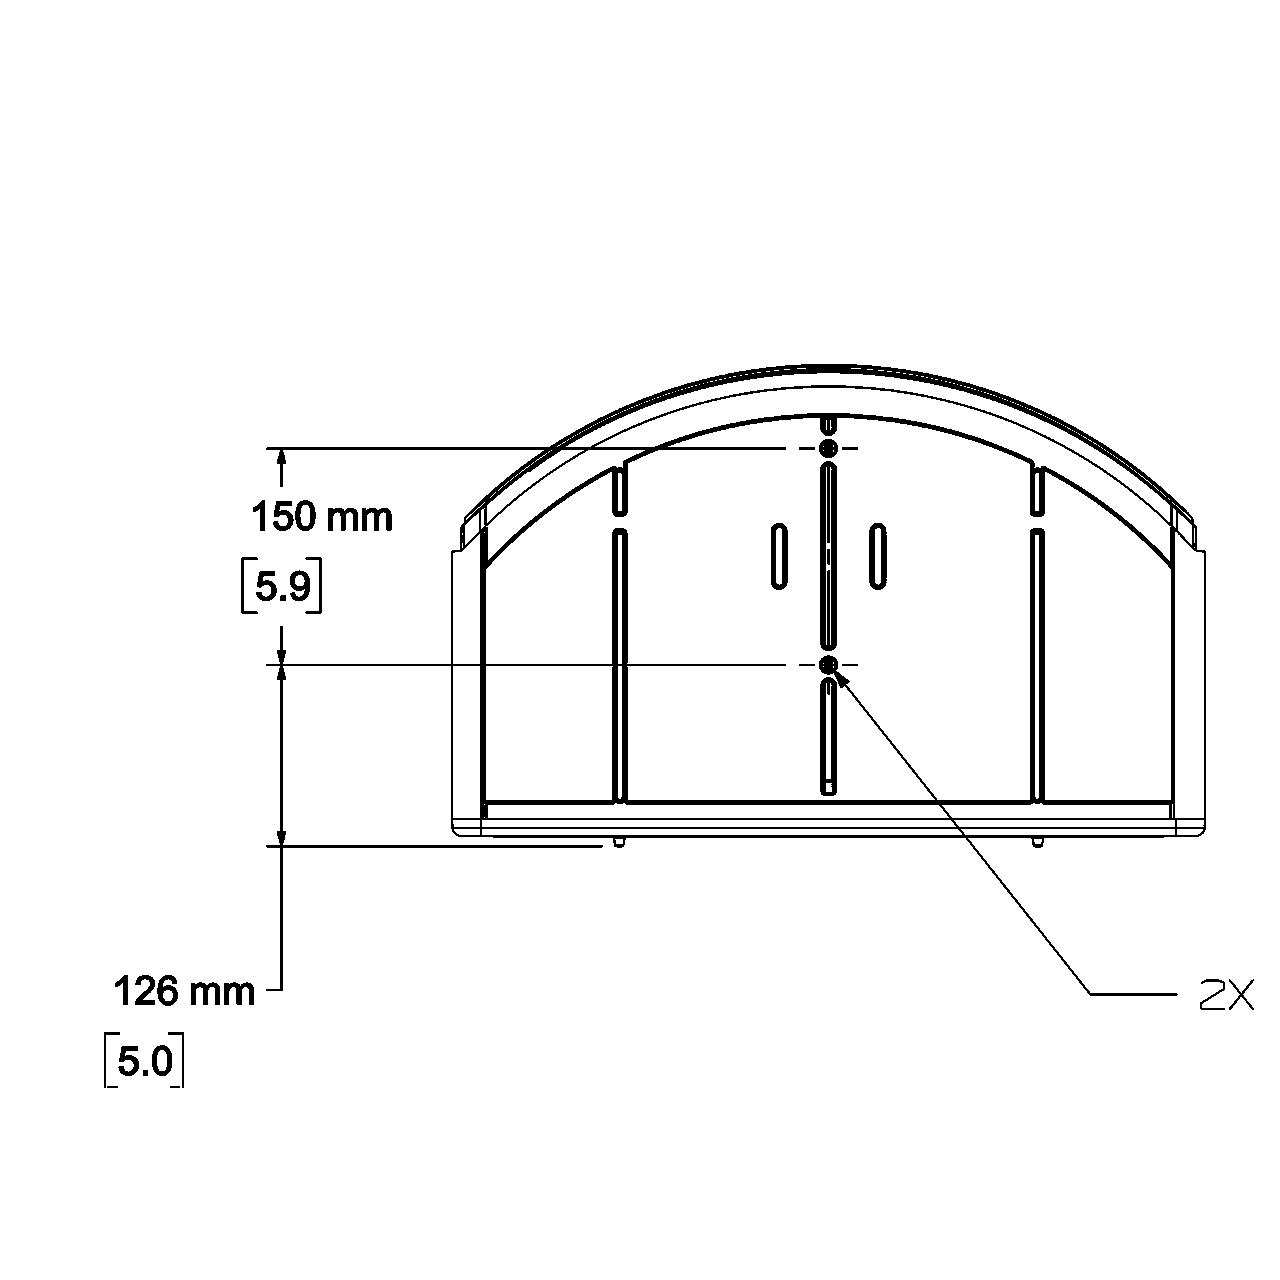 panaray 802 series iv loudspeaker